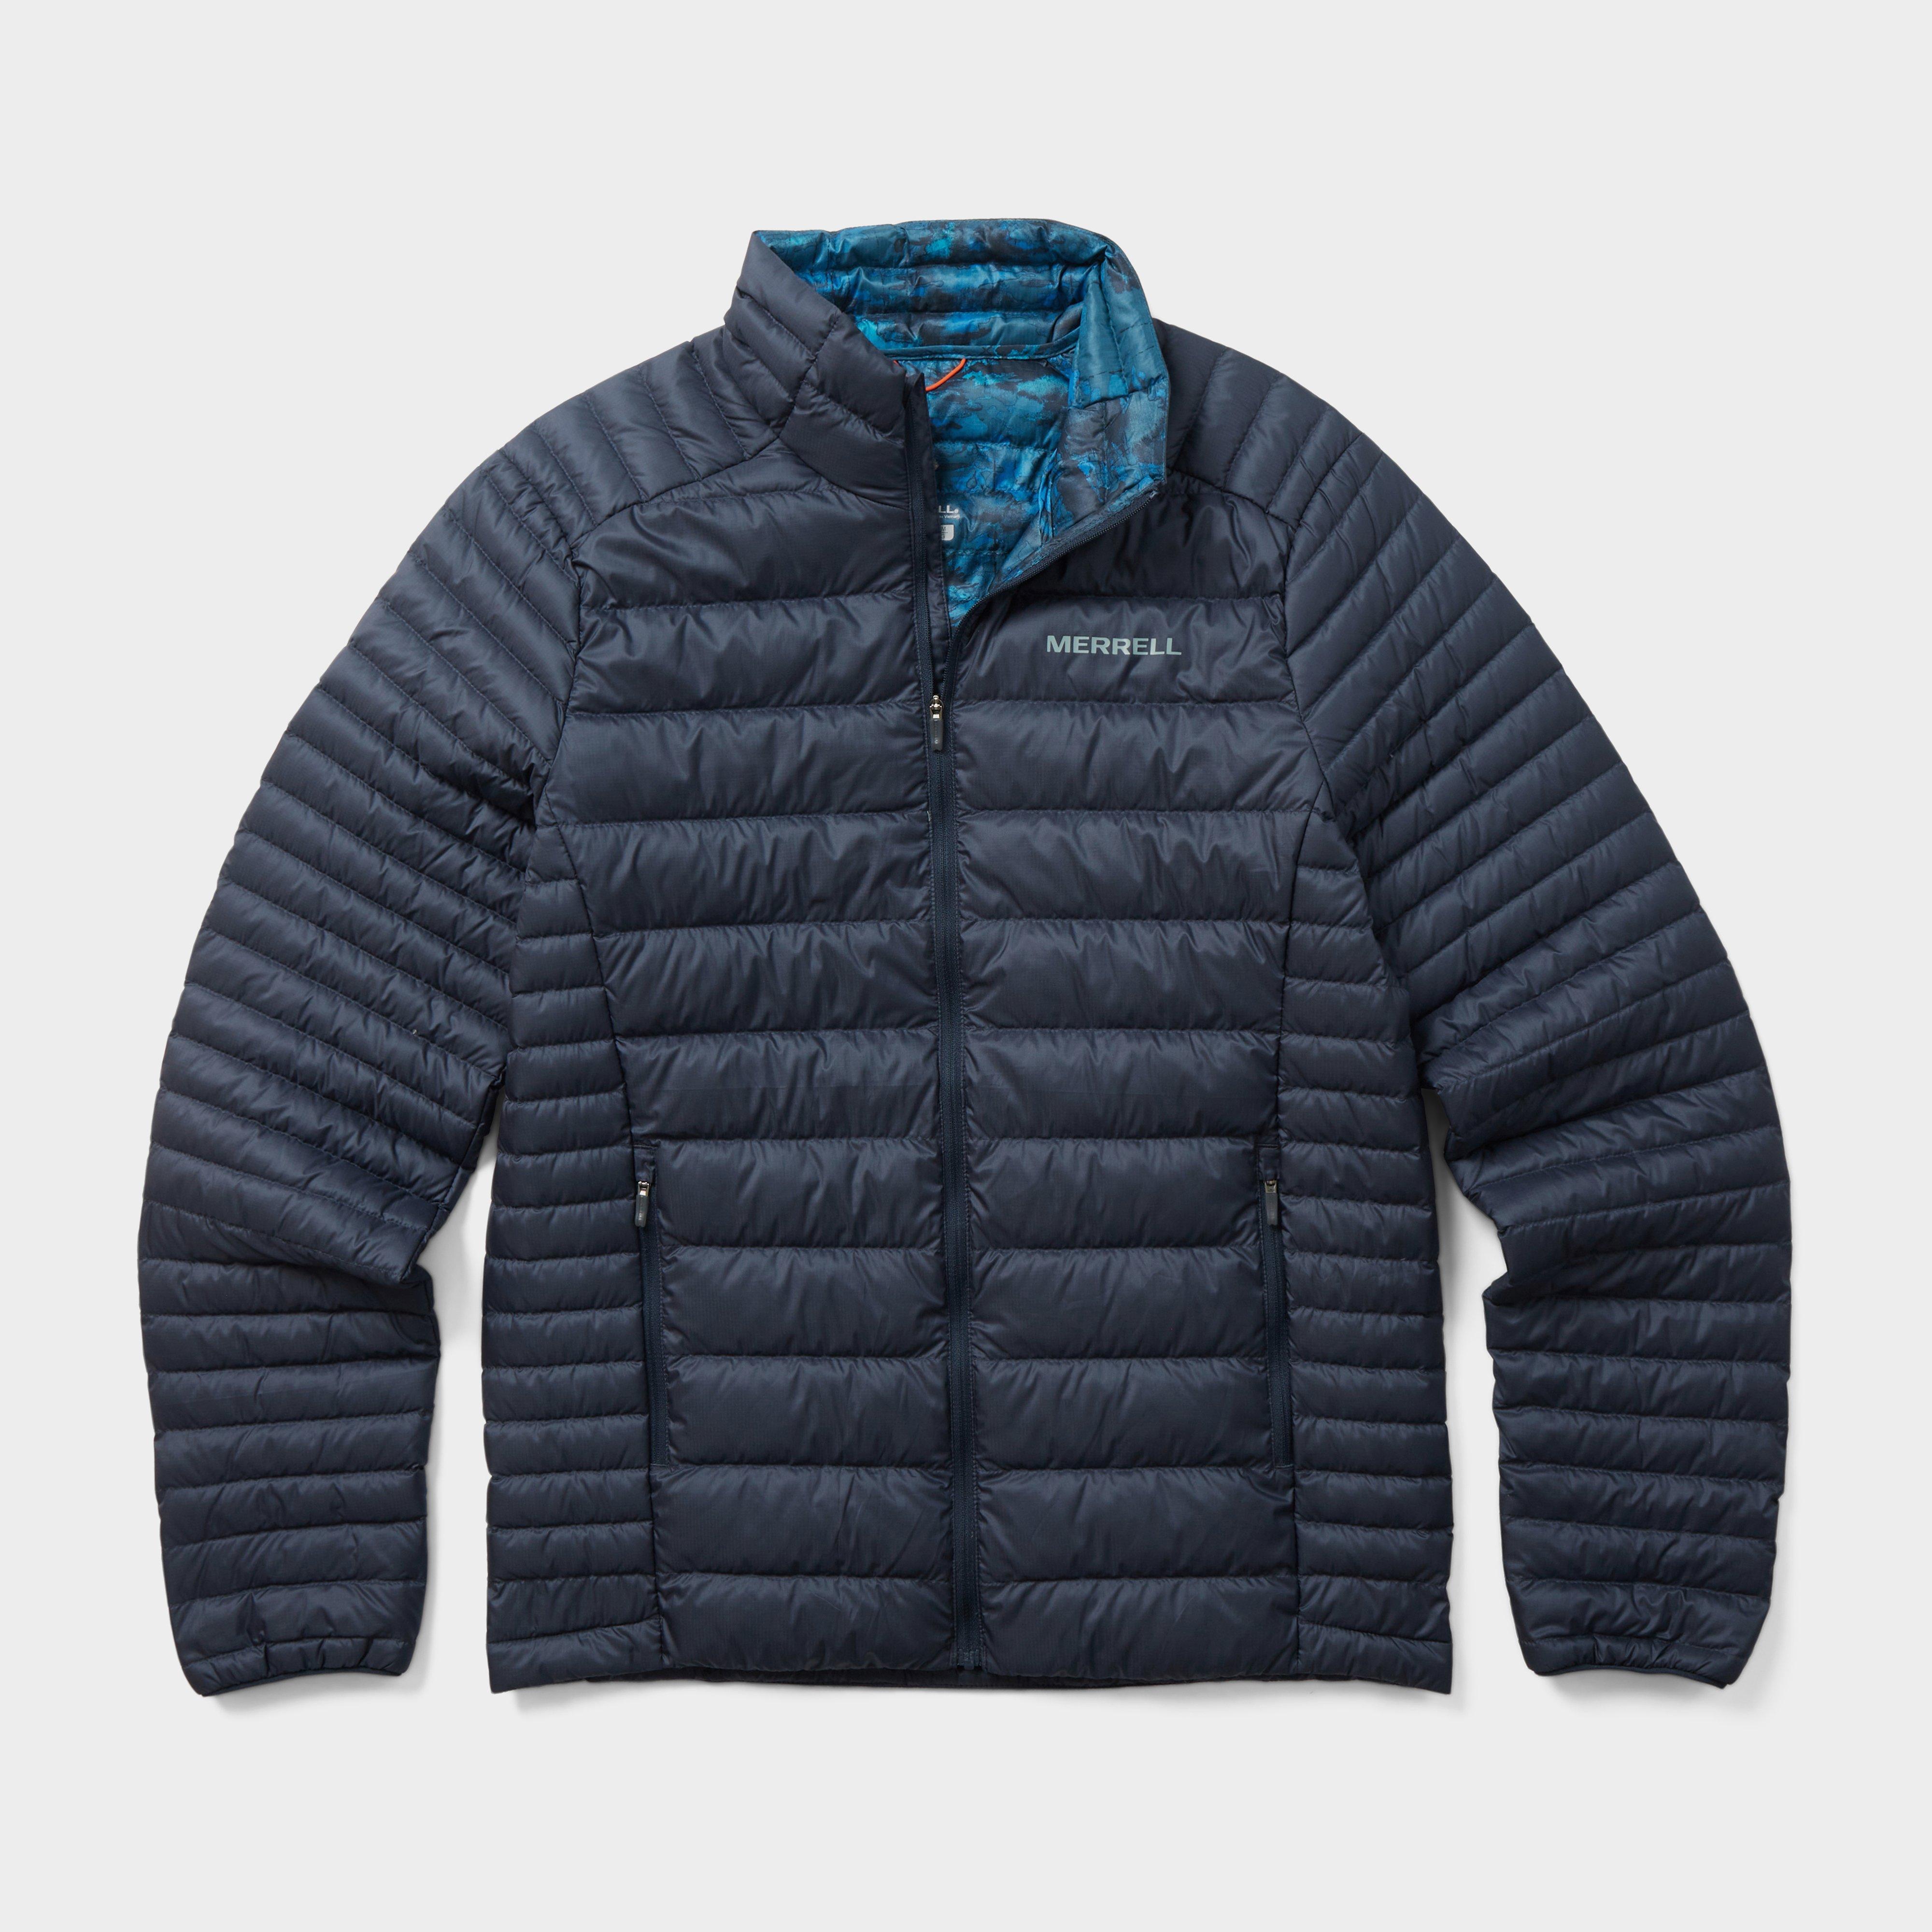 Merrell Men's Ridgevent Thermo Insulated Jacket - Navy/Navy Blue, Navy